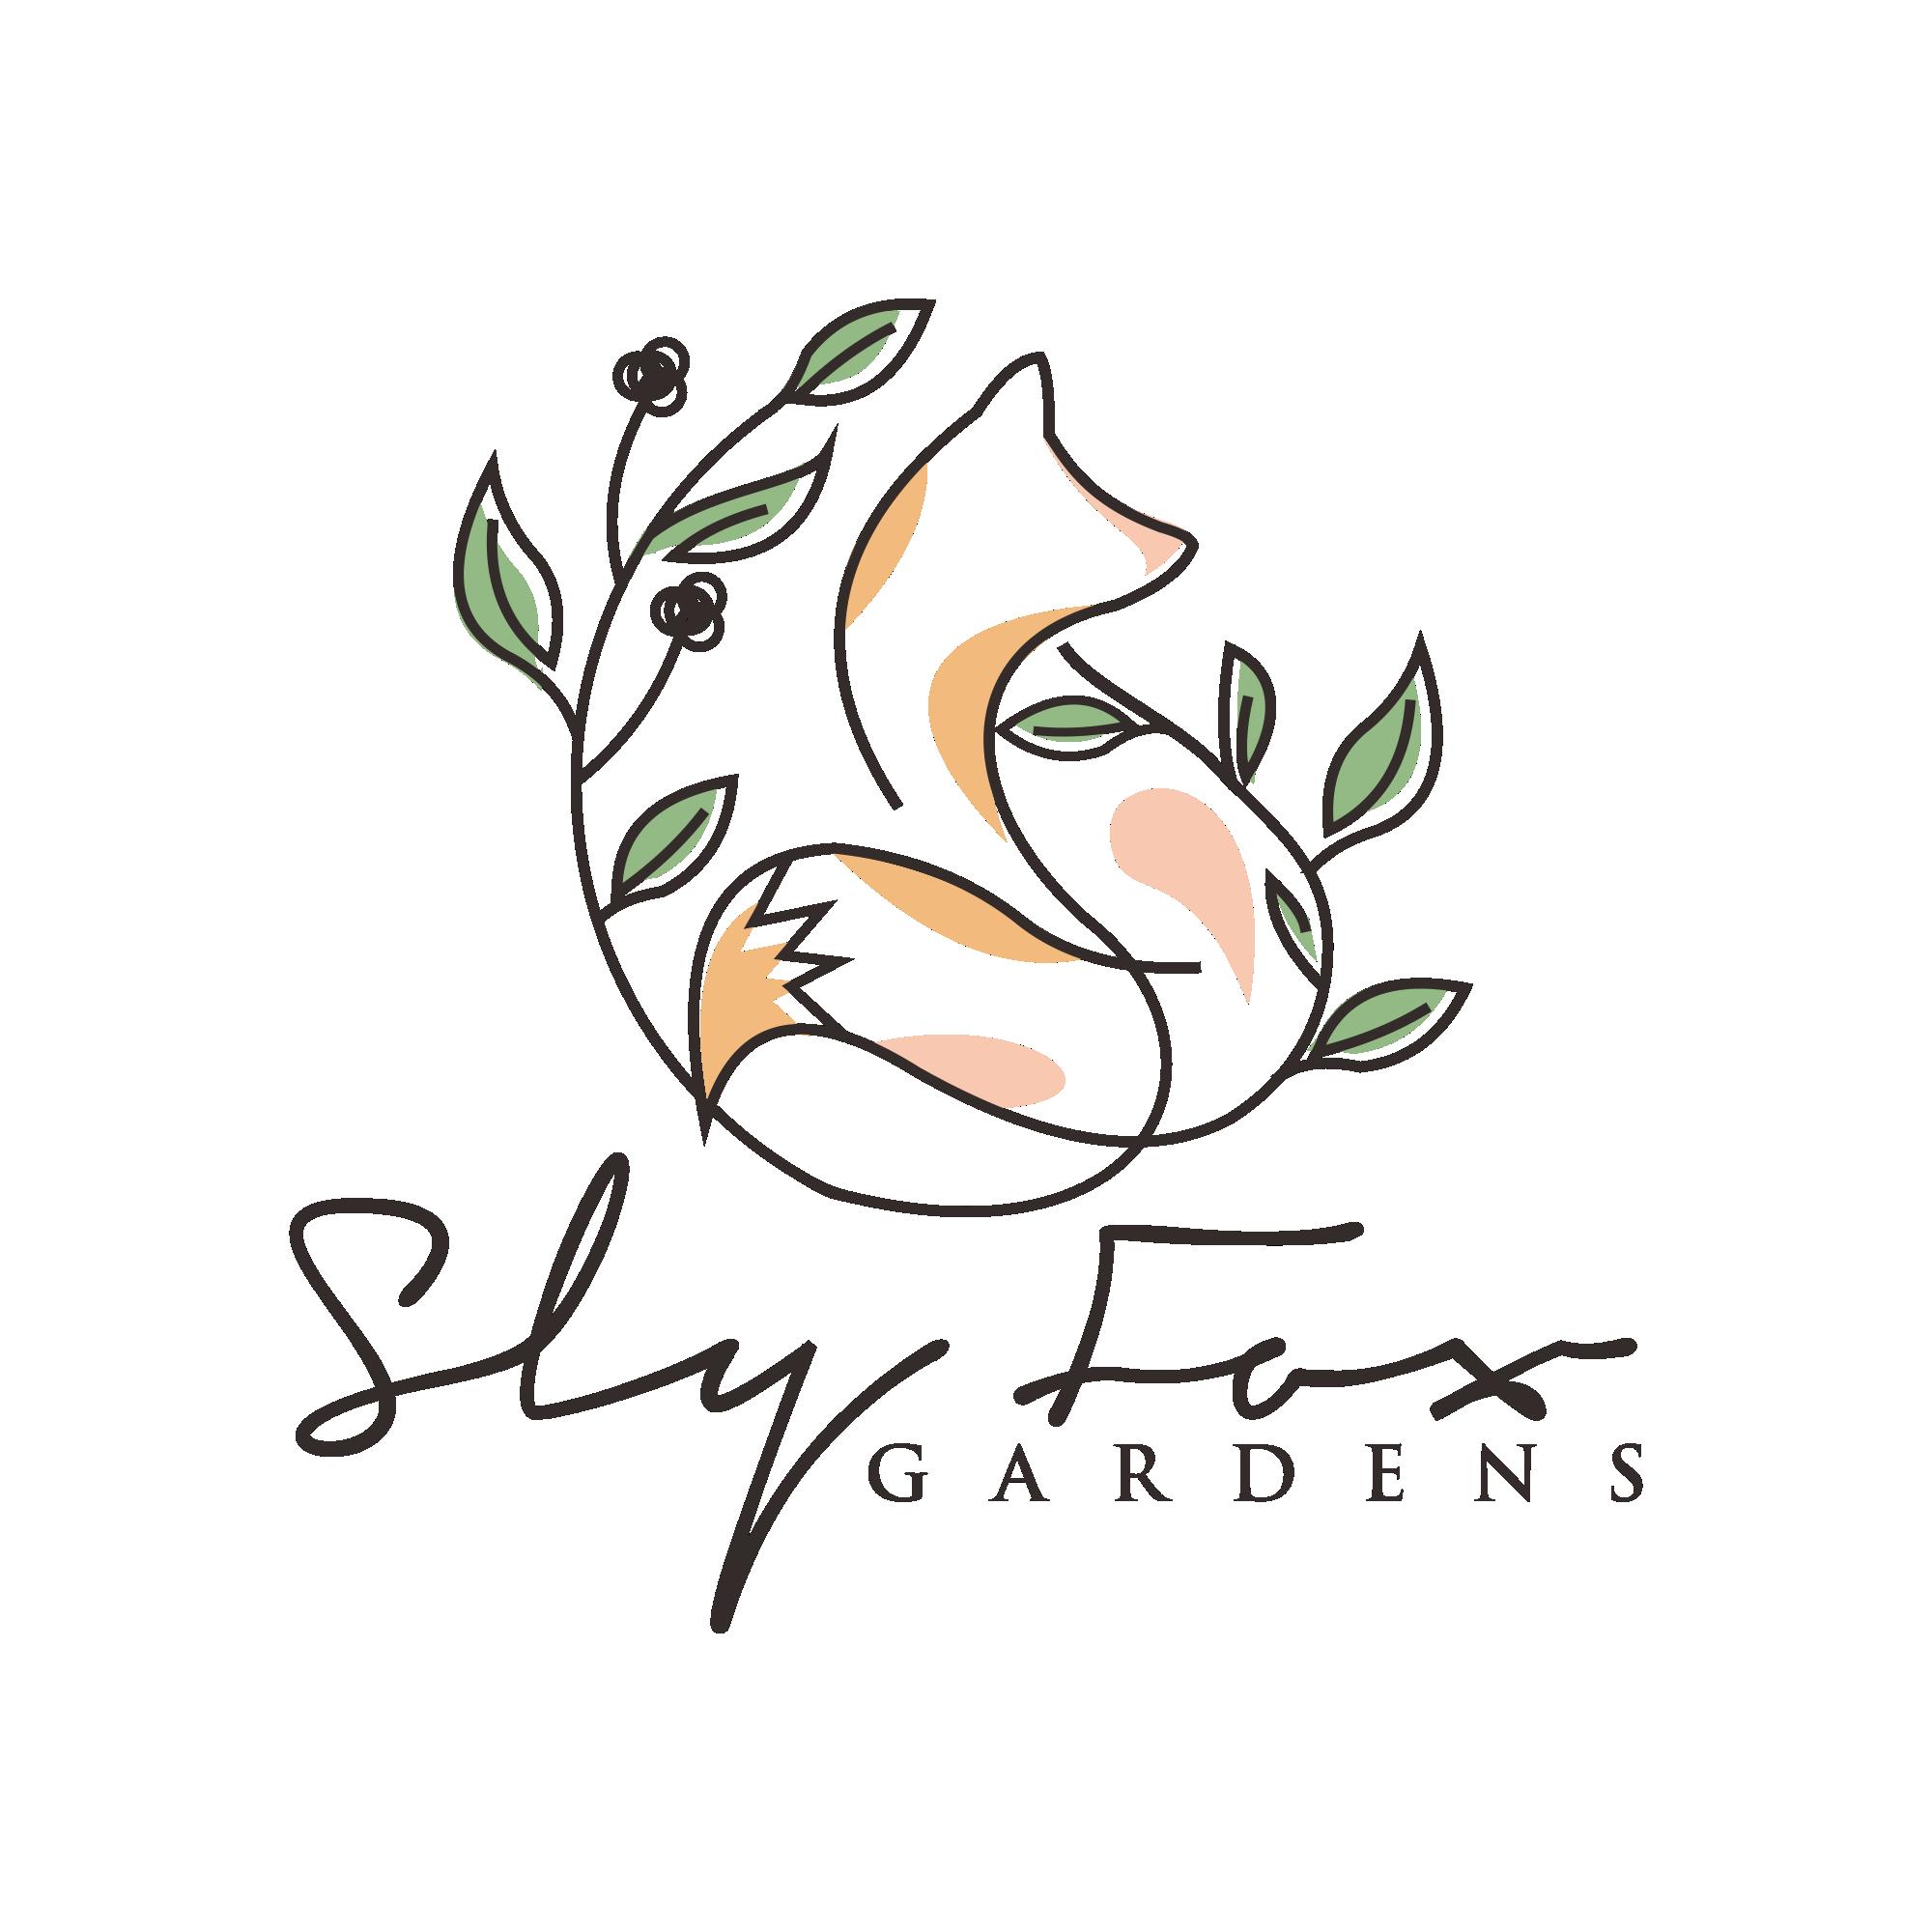 quirky, modern logo for a woman-run ecological gardening/urban farm business